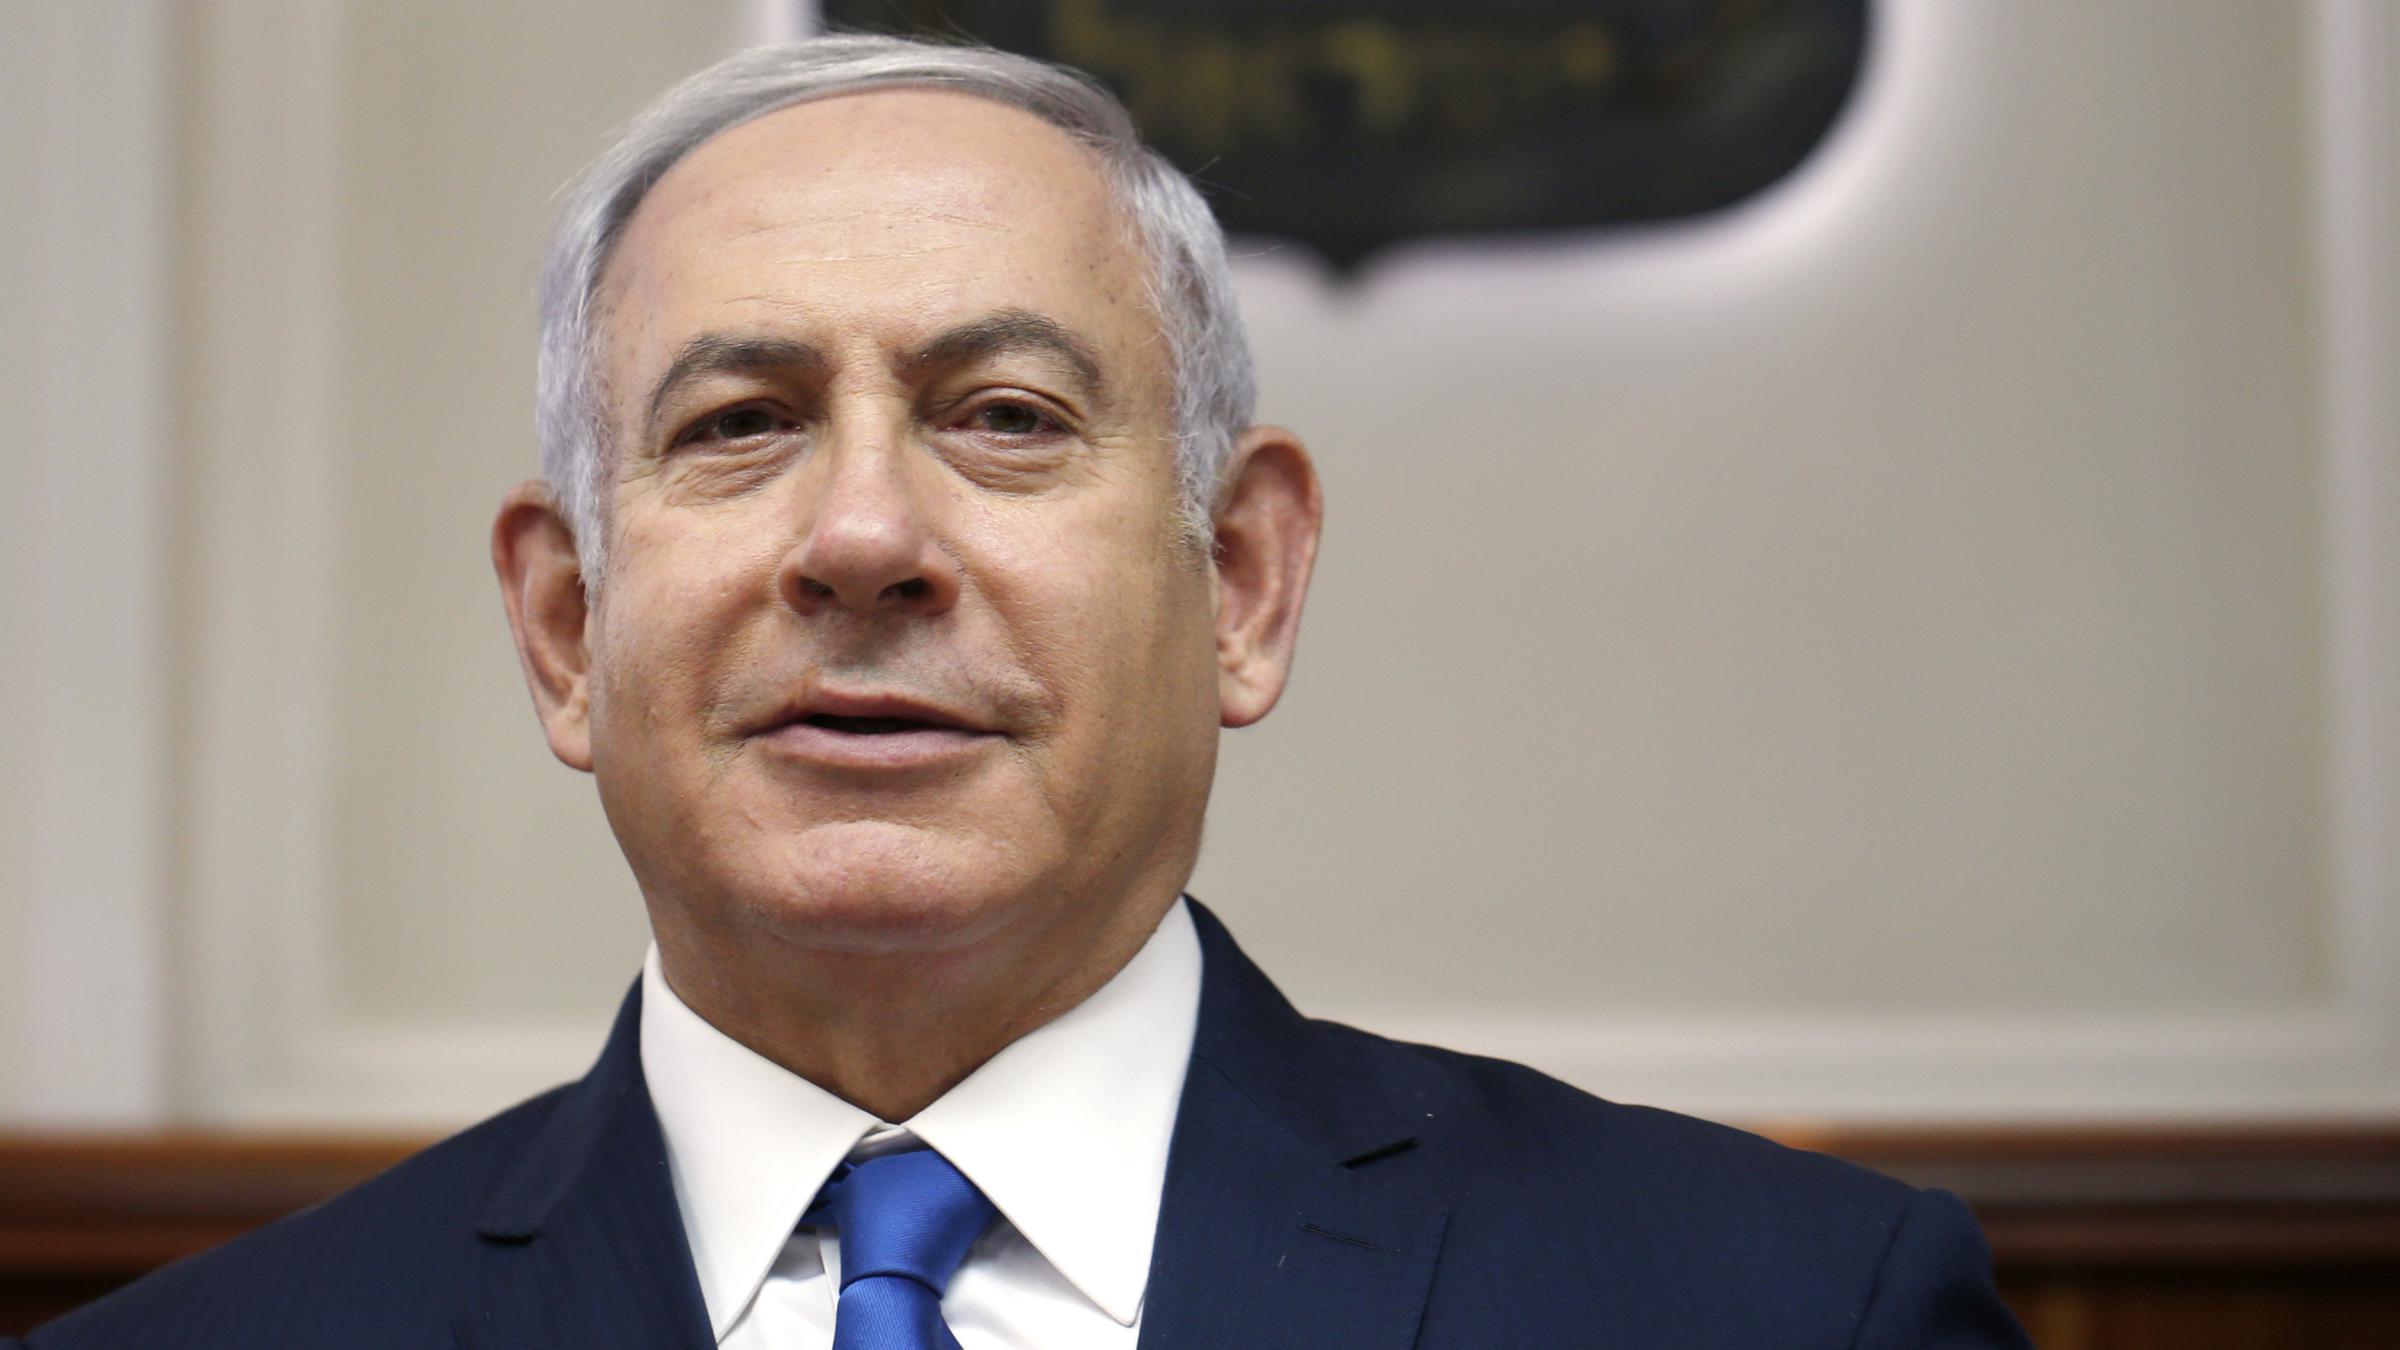 Israel Formally Defines Itself As